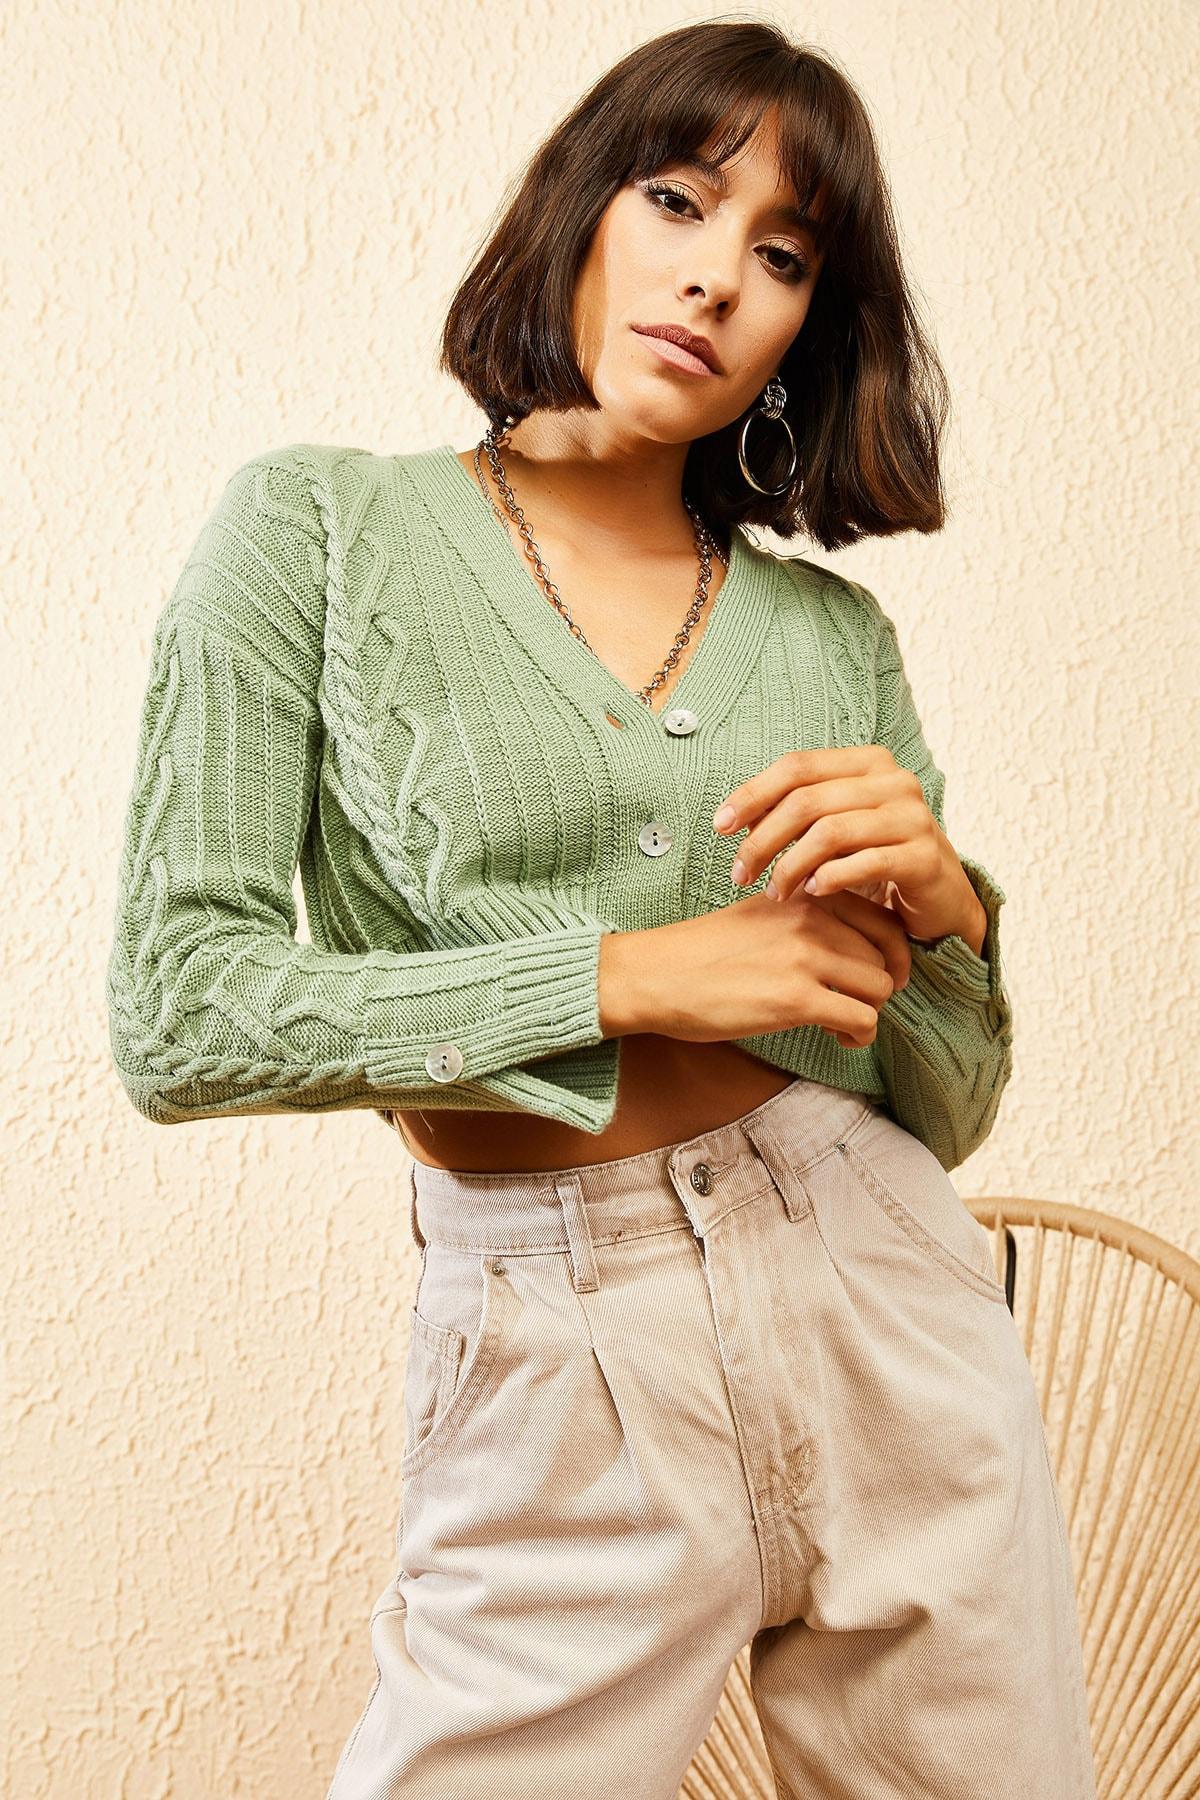 Bianco Lucci Kadın Çağla Yeşili Sac Detaylı Düğmeli Triko Hırka 10121082 3